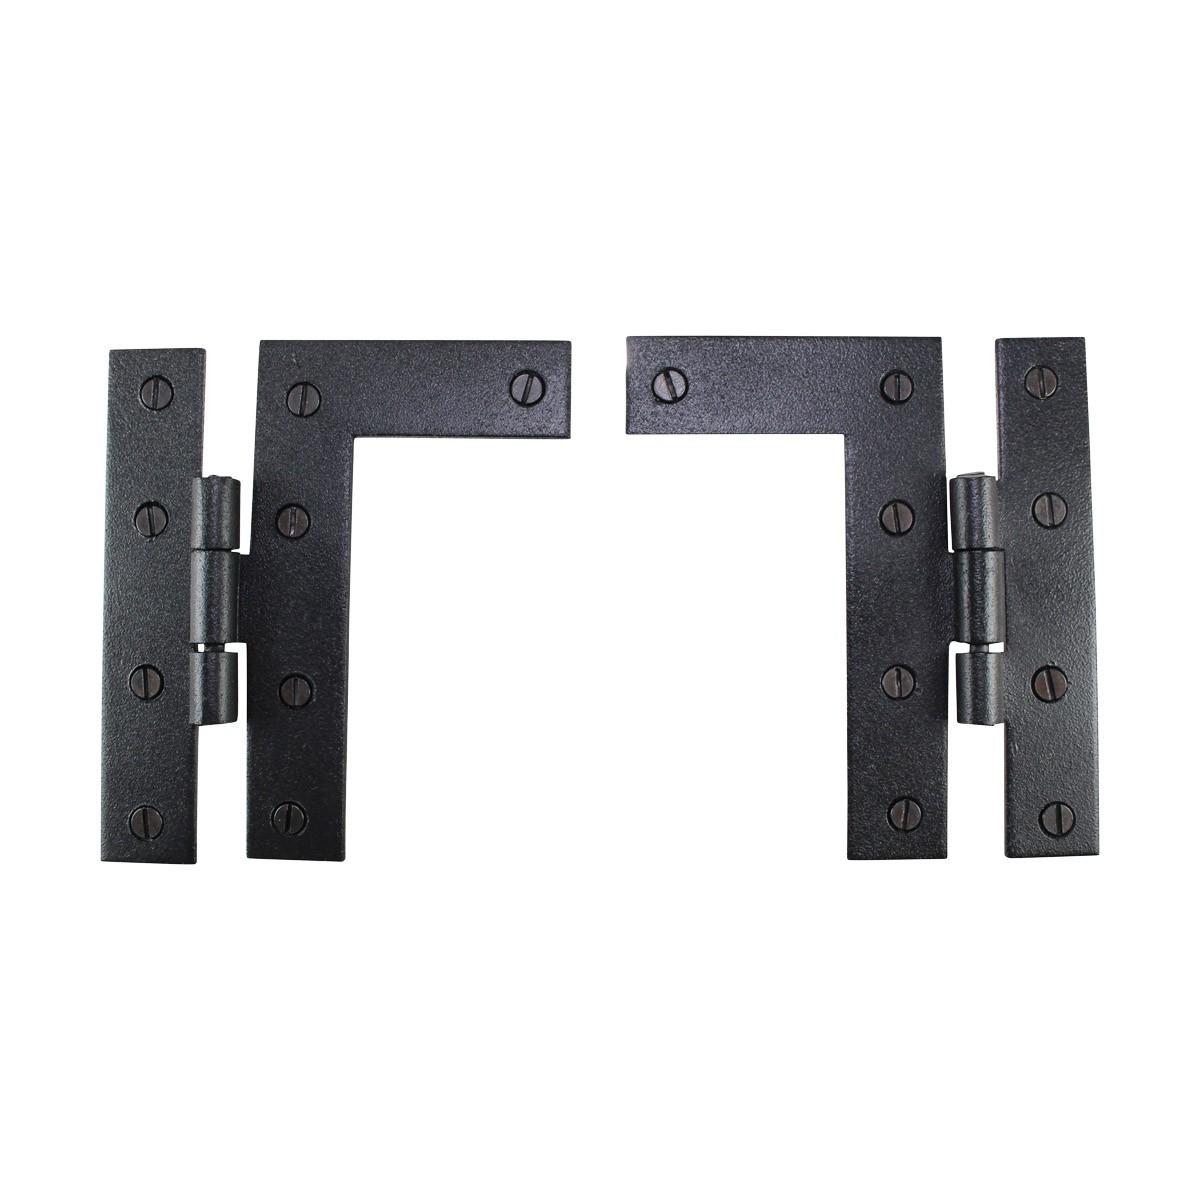 Pair Flush HL Cabinet Hinge Wrought Iron 4.5H Pack of 2 Door Hinges Door Hinge Solid Brass Hinge